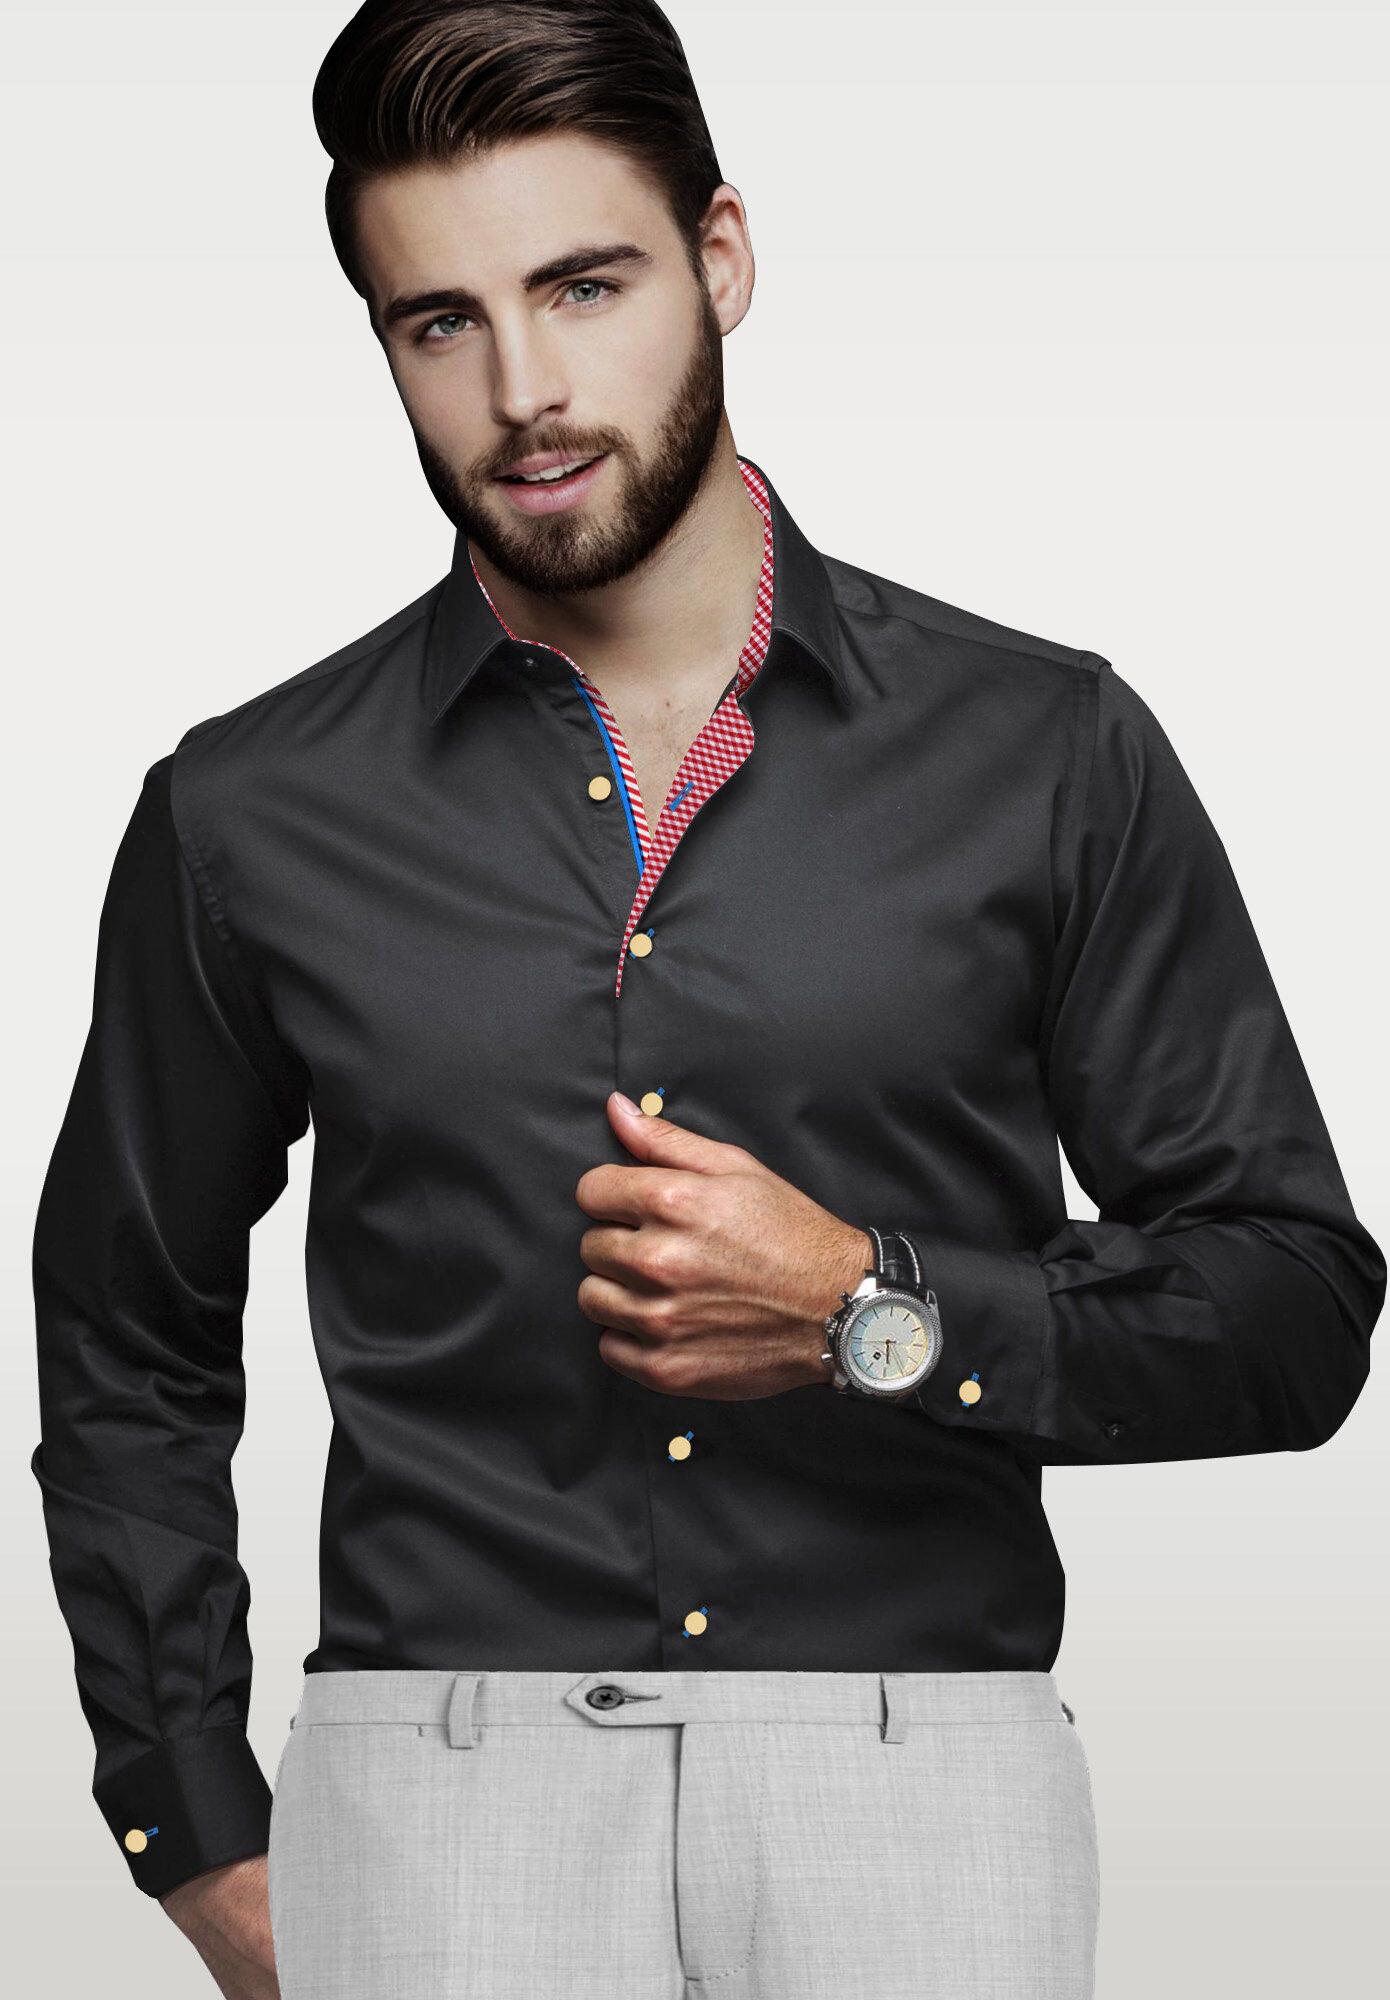 Black Mens Dress Shirts